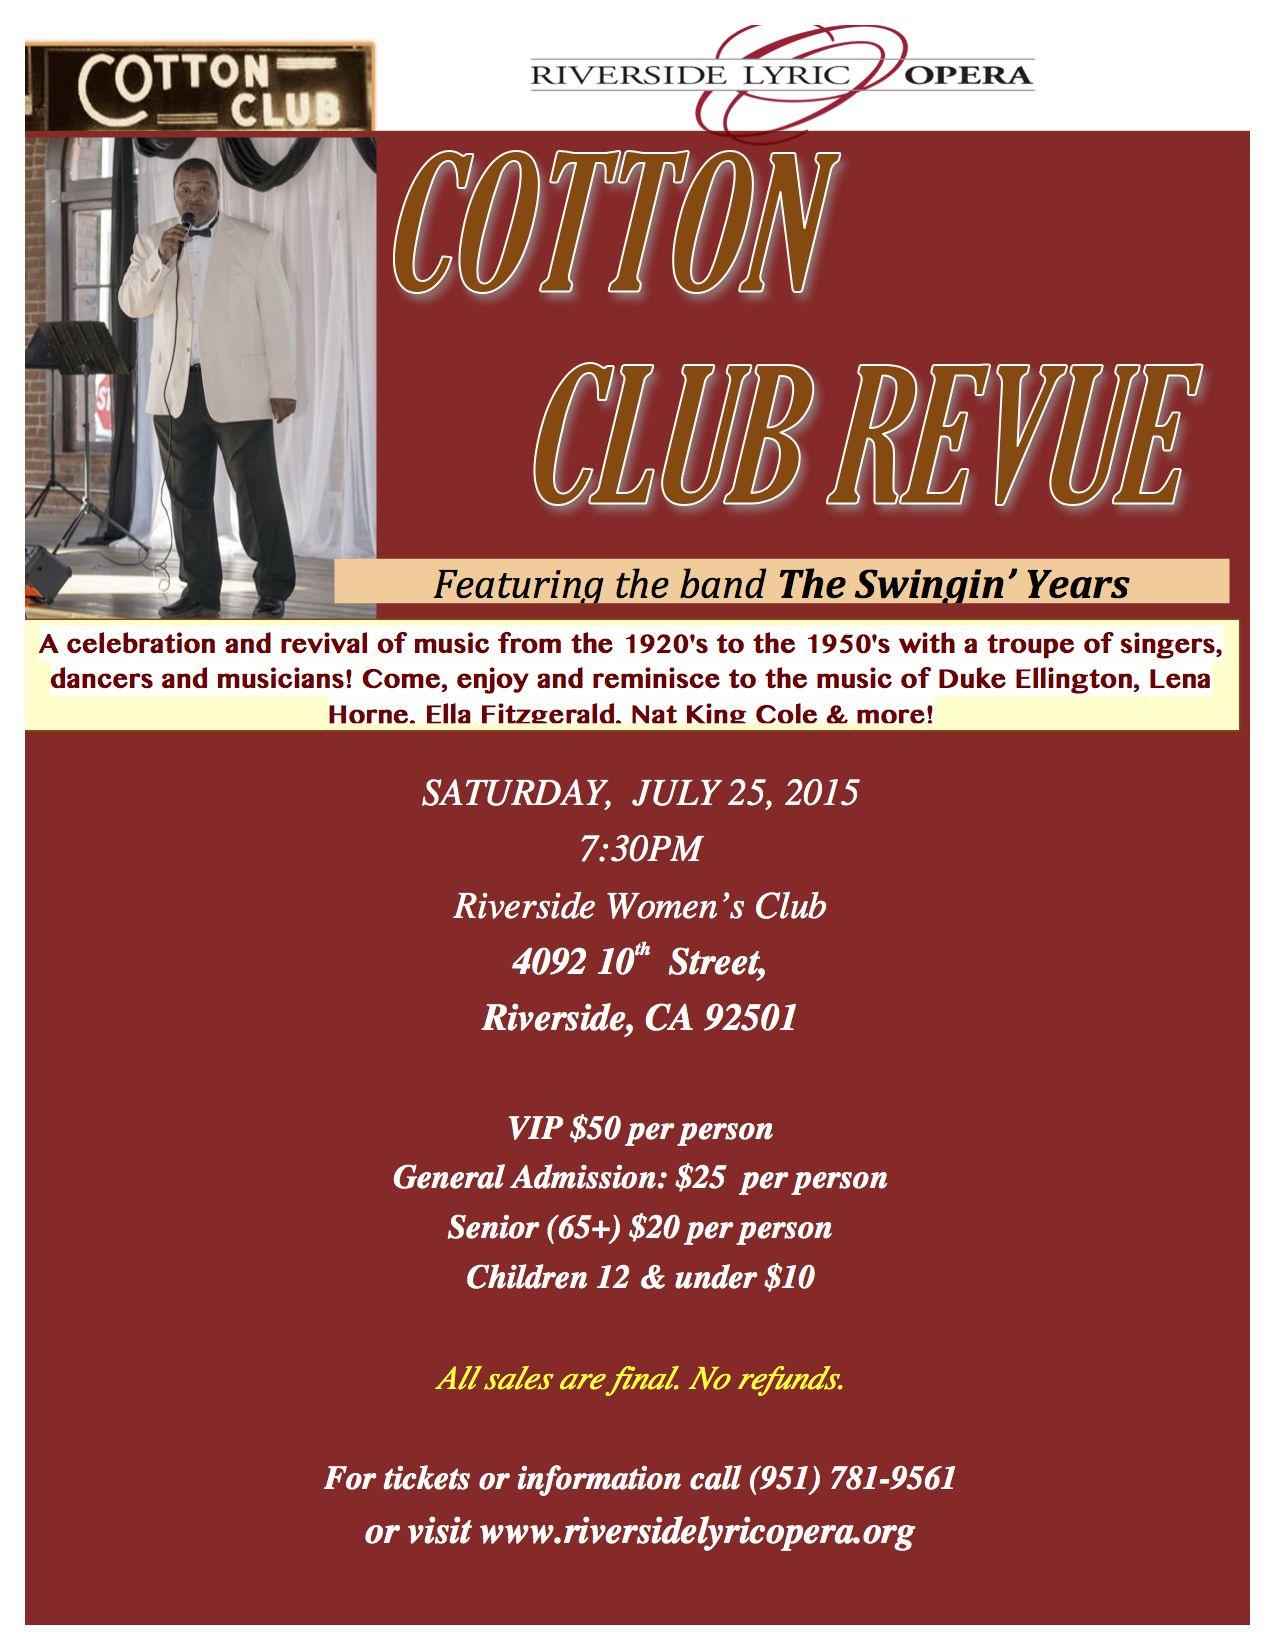 This Year S Cotton Club Revue At The Riverside Women S Club Cotton Club Lyric Opera Singer